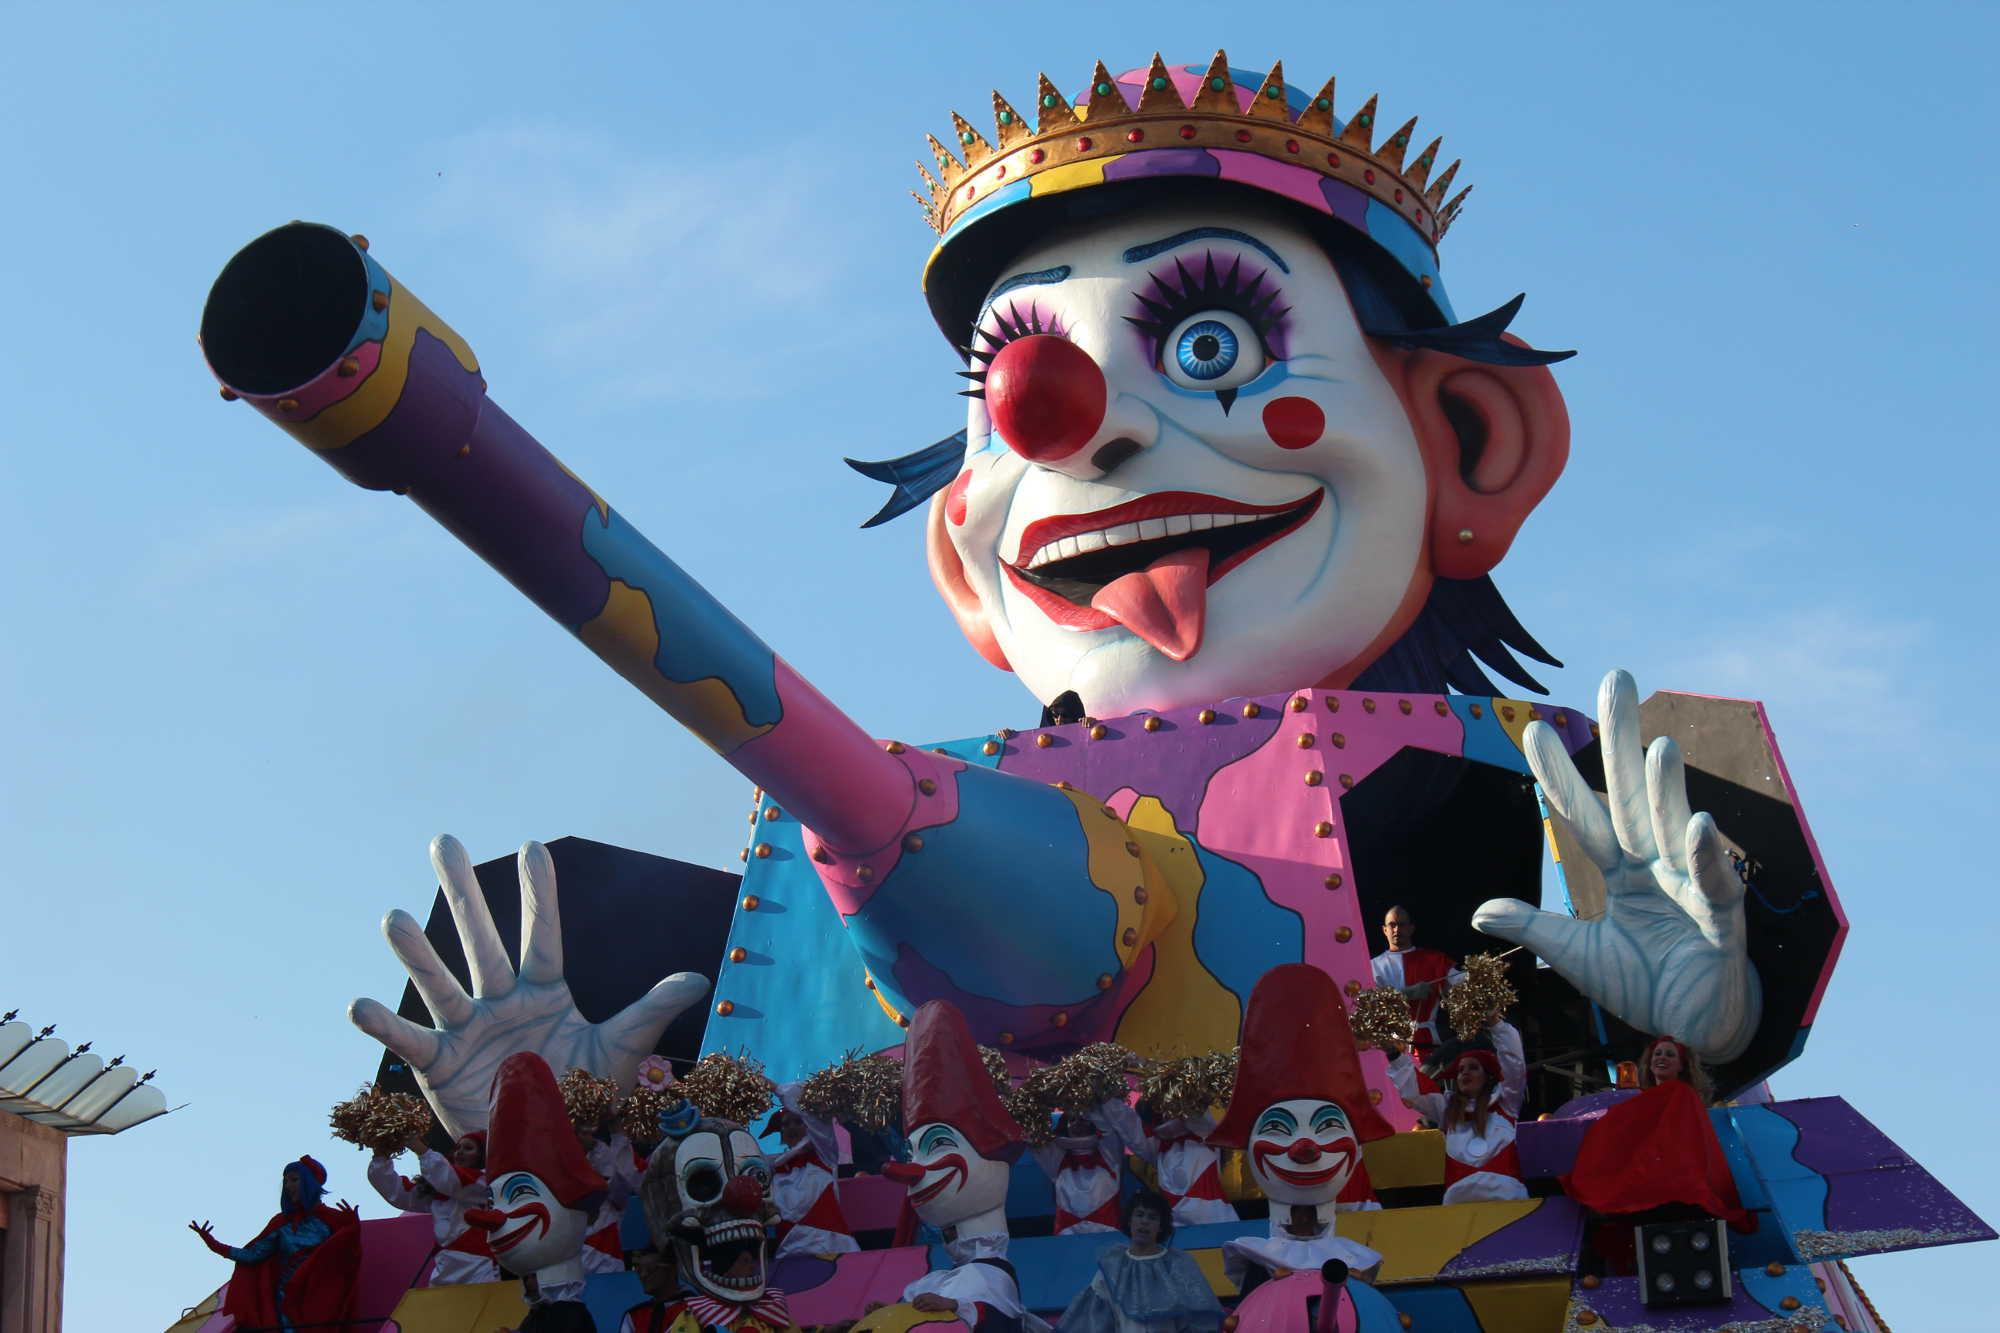 Mardi Gras Clown Float, Viareggio, Tuscany, Italy